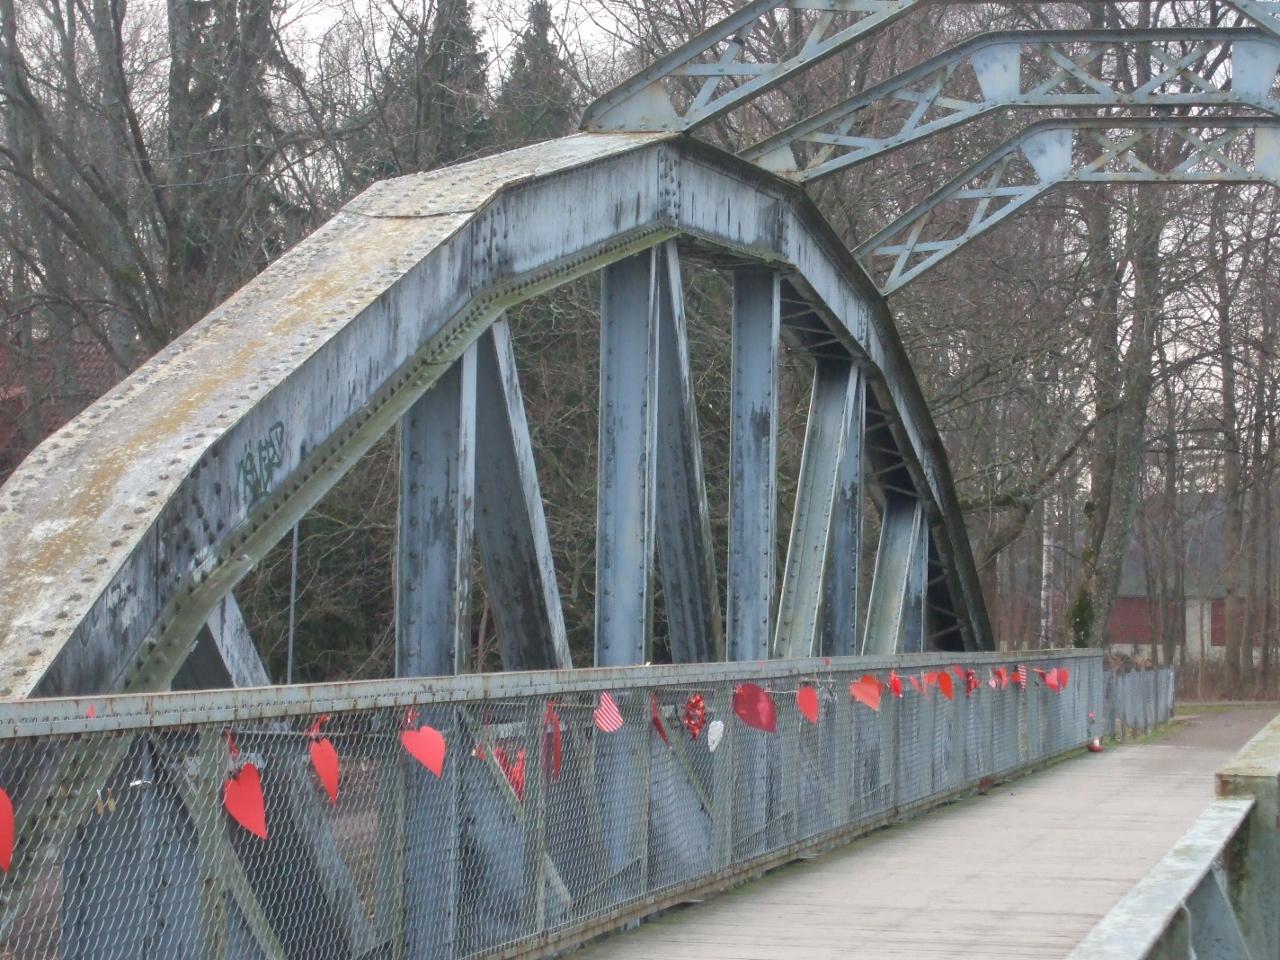 2014-02-14 Alla hjärtans dag Pyttebron 015 (1280x960)